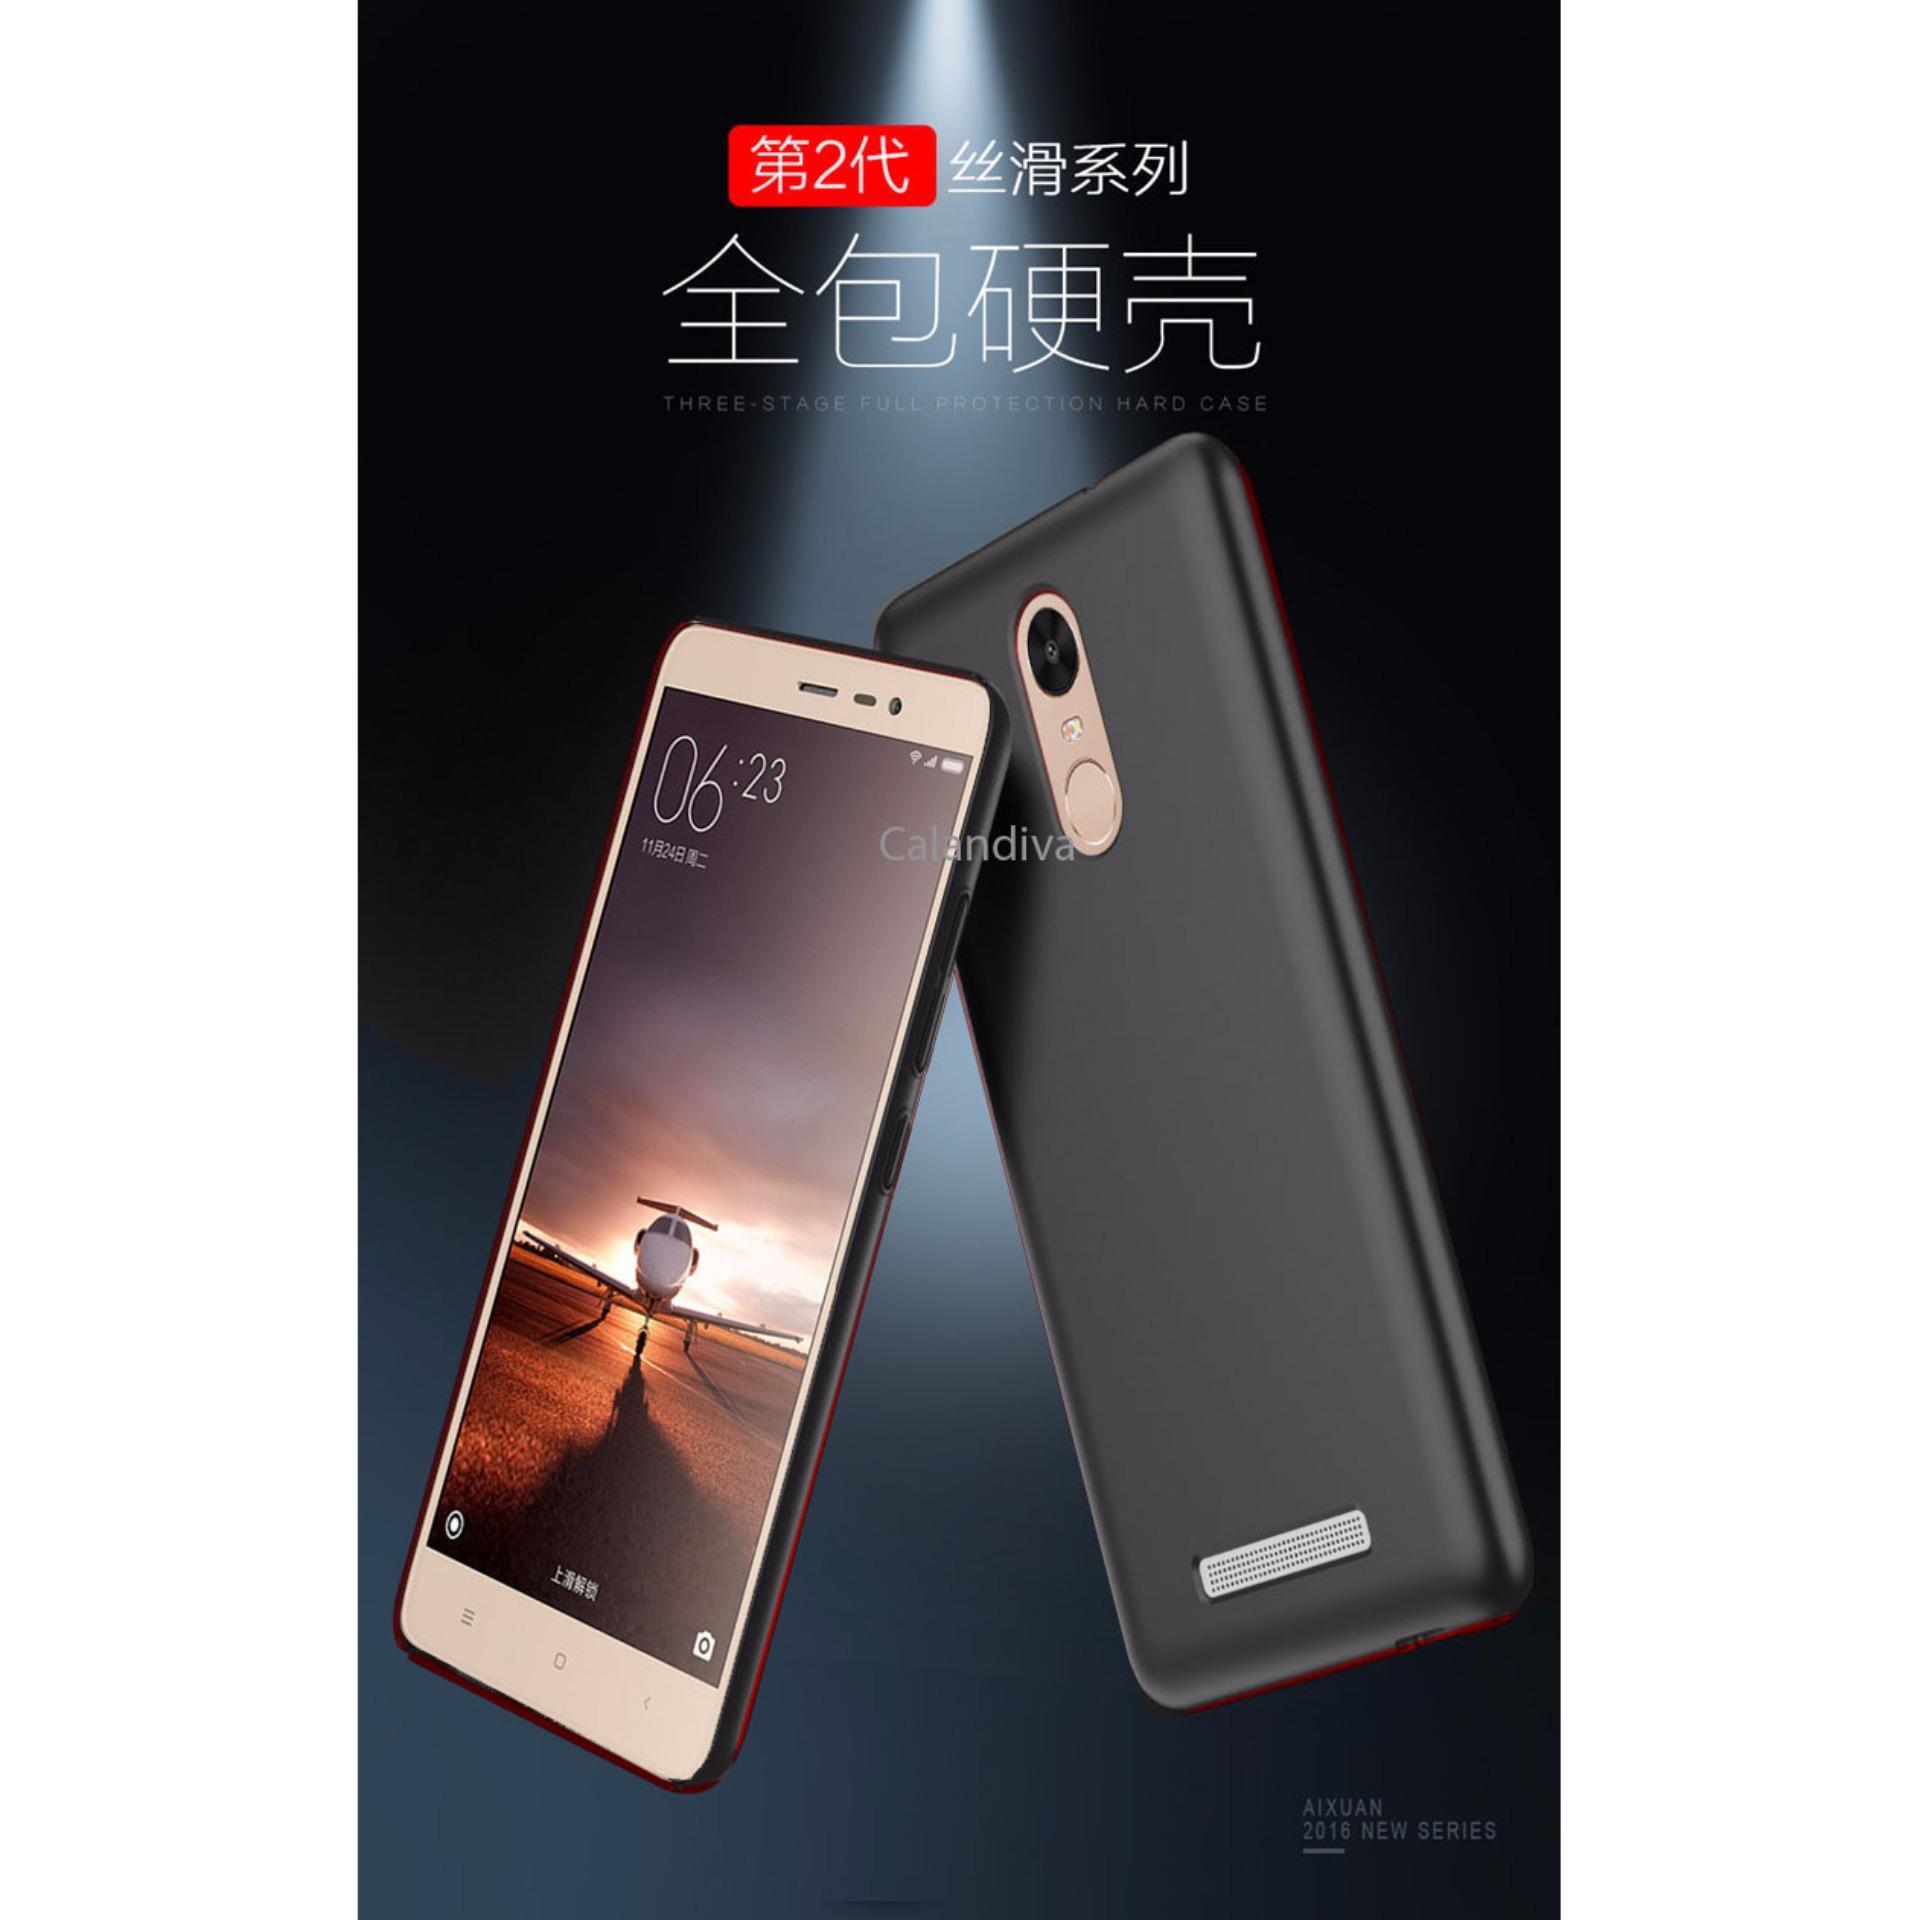 Calandiva 360 Degree Protection Slim Hardcase for Xiaomi Redmi Note 3 / Pro versi Kenzo .